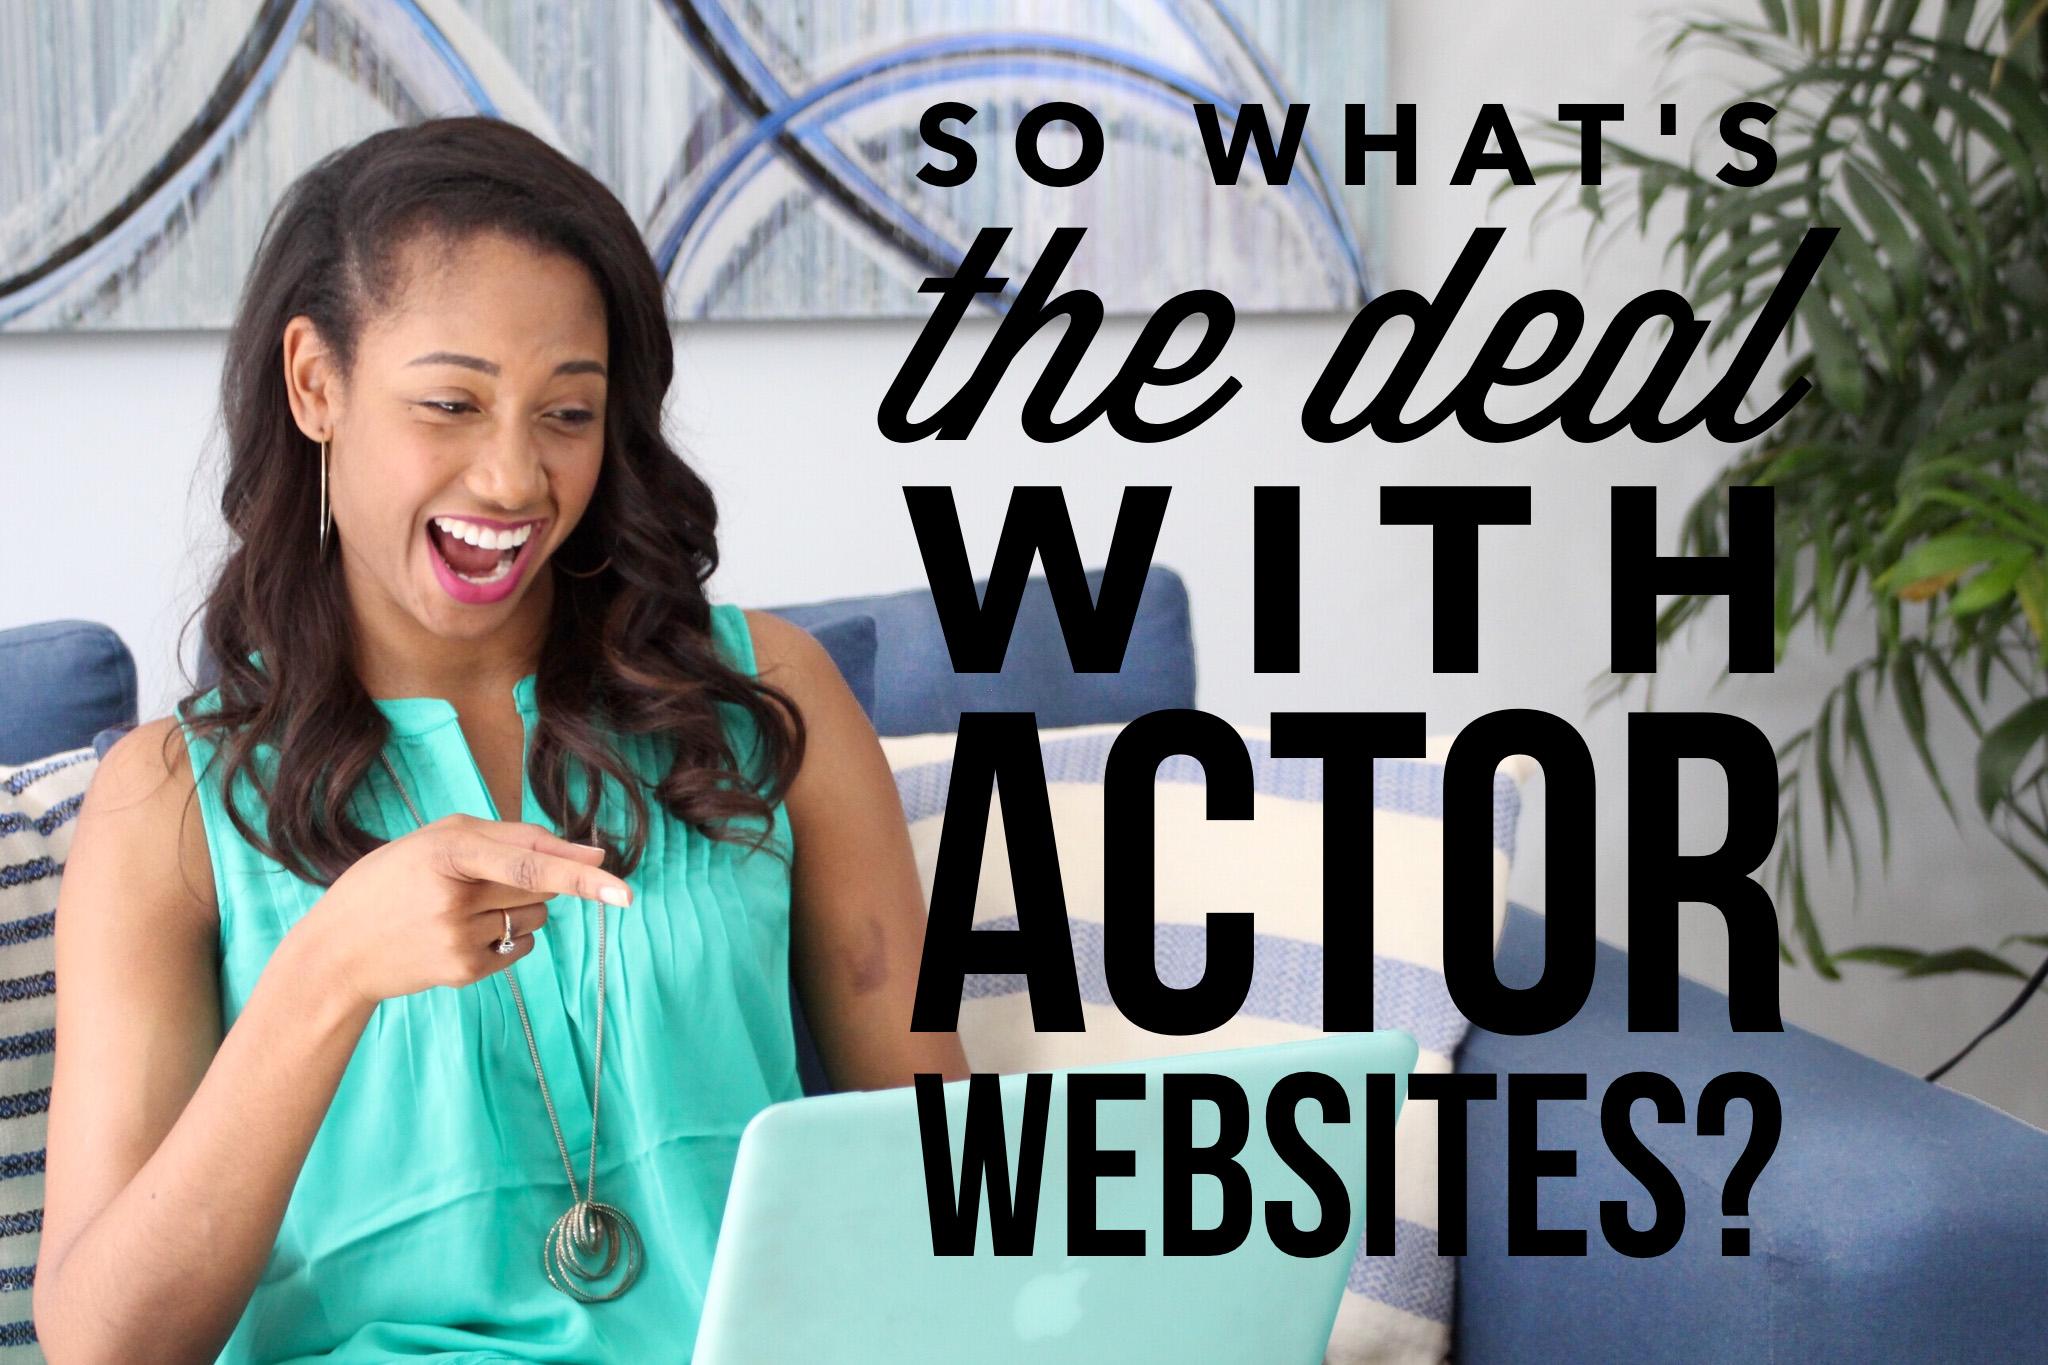 So What's The Deal With Actor Websites?   Workshop Guru